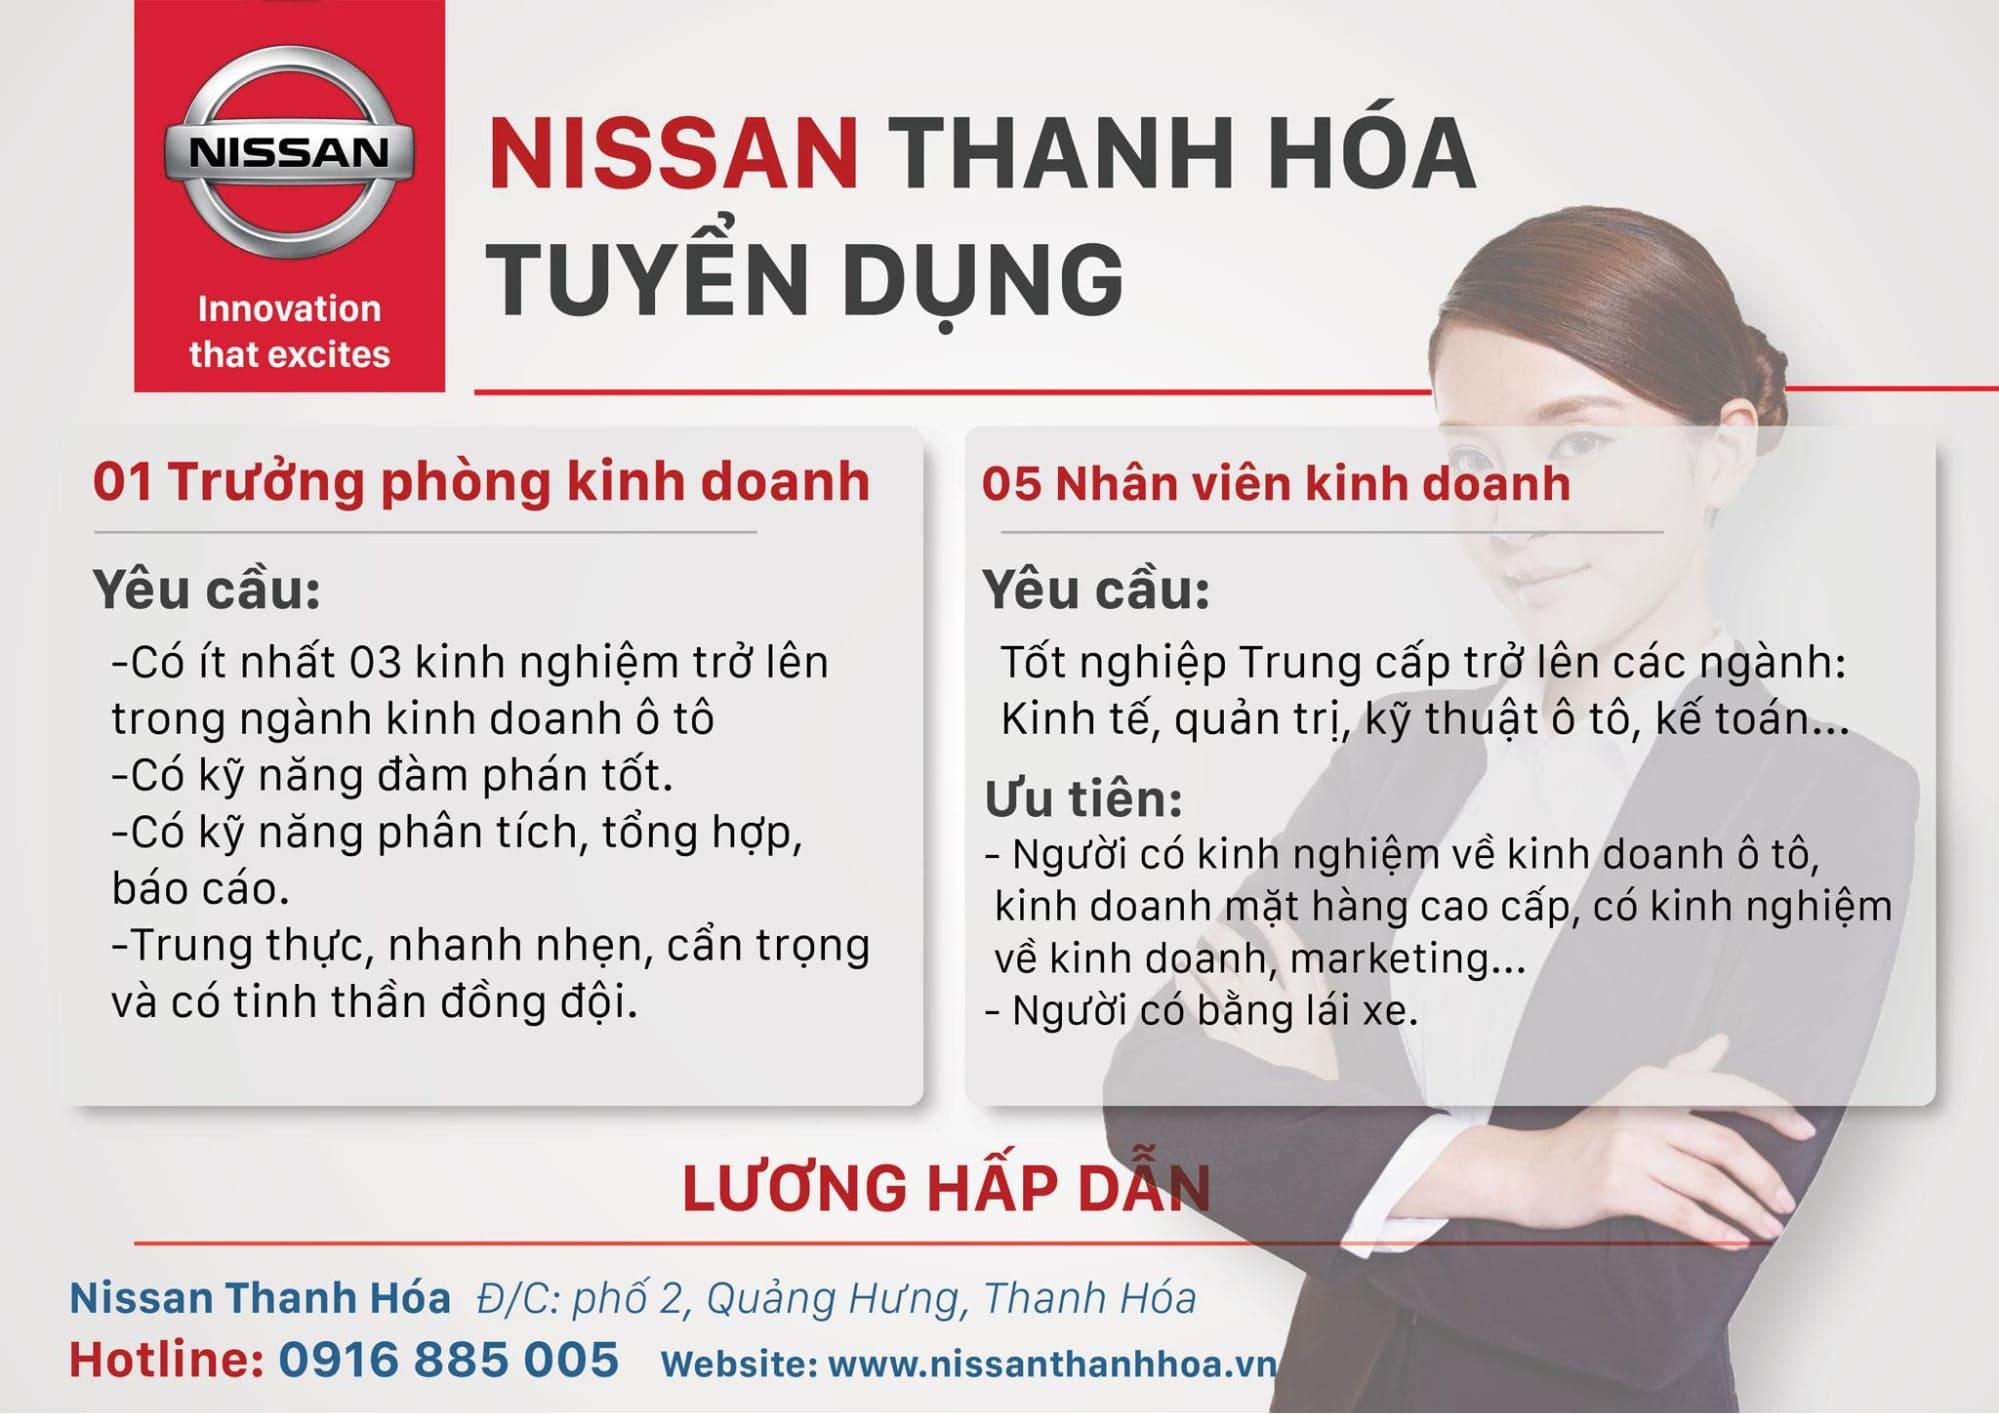 poster tuyển dụng của nissan